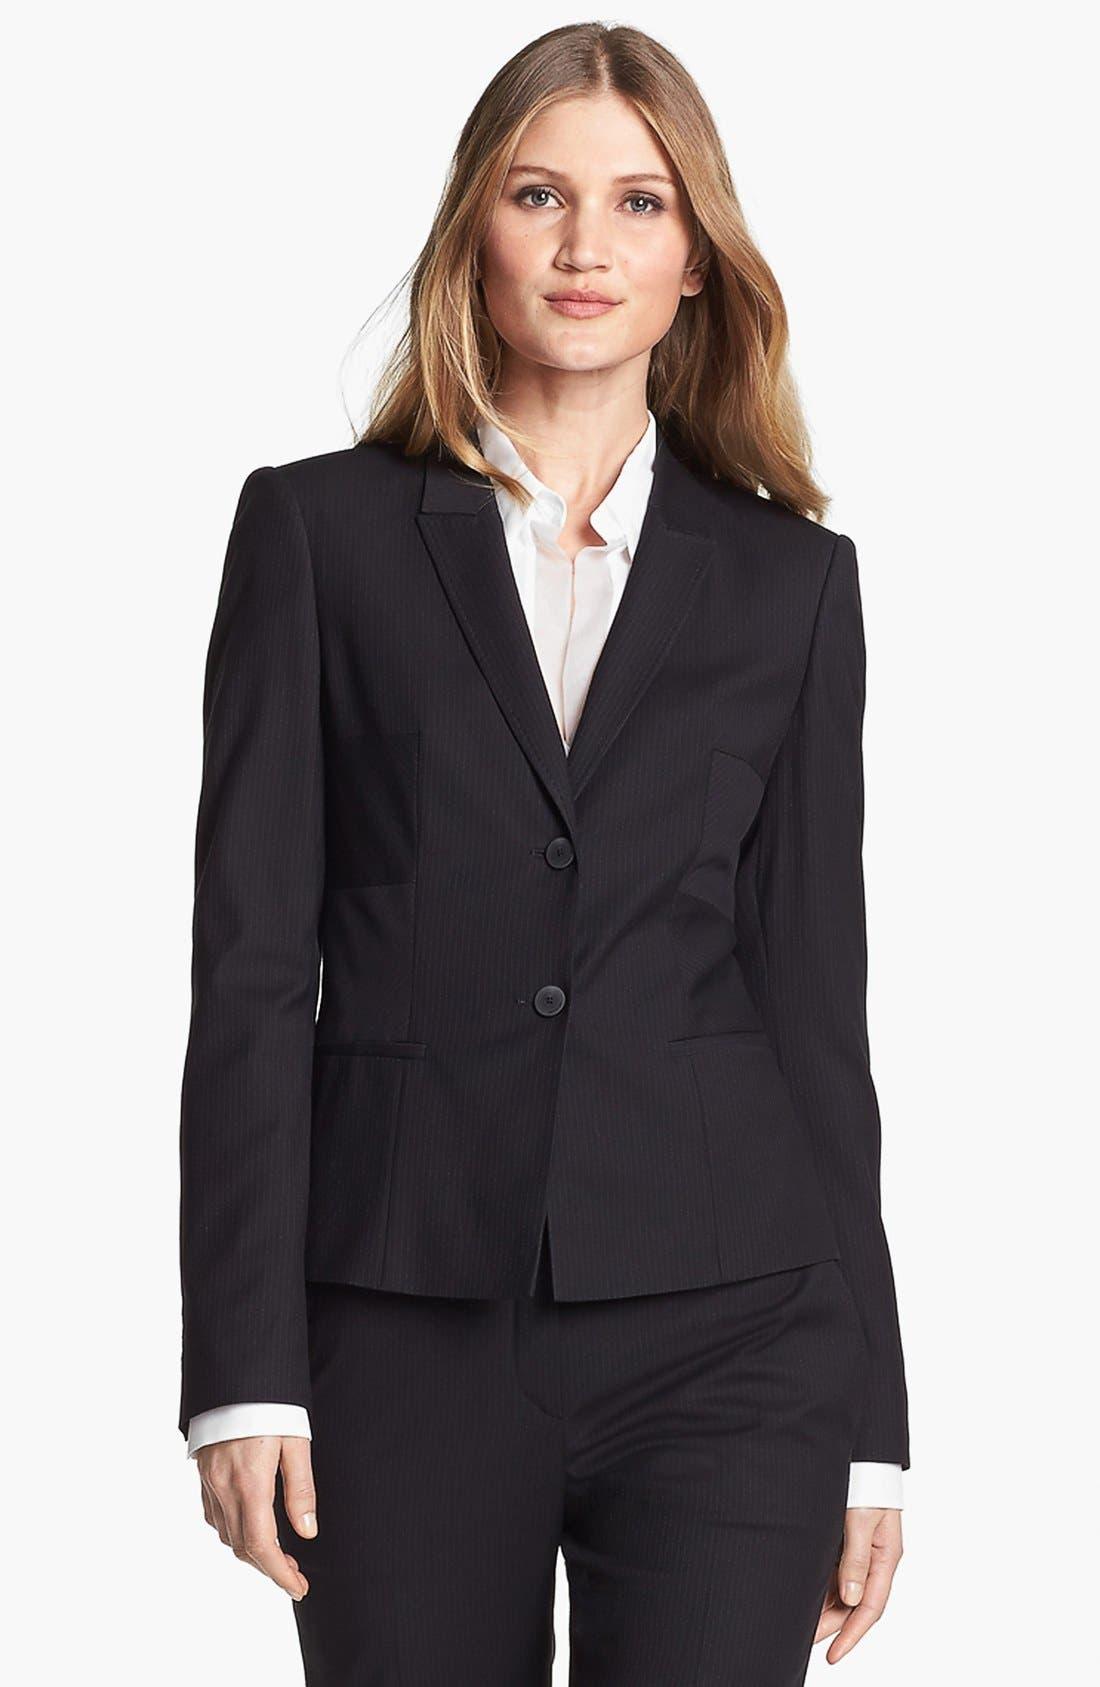 Alternate Image 1 Selected - BOSS HUGO BOSS 'Jilisa' Pinstripe Jacket